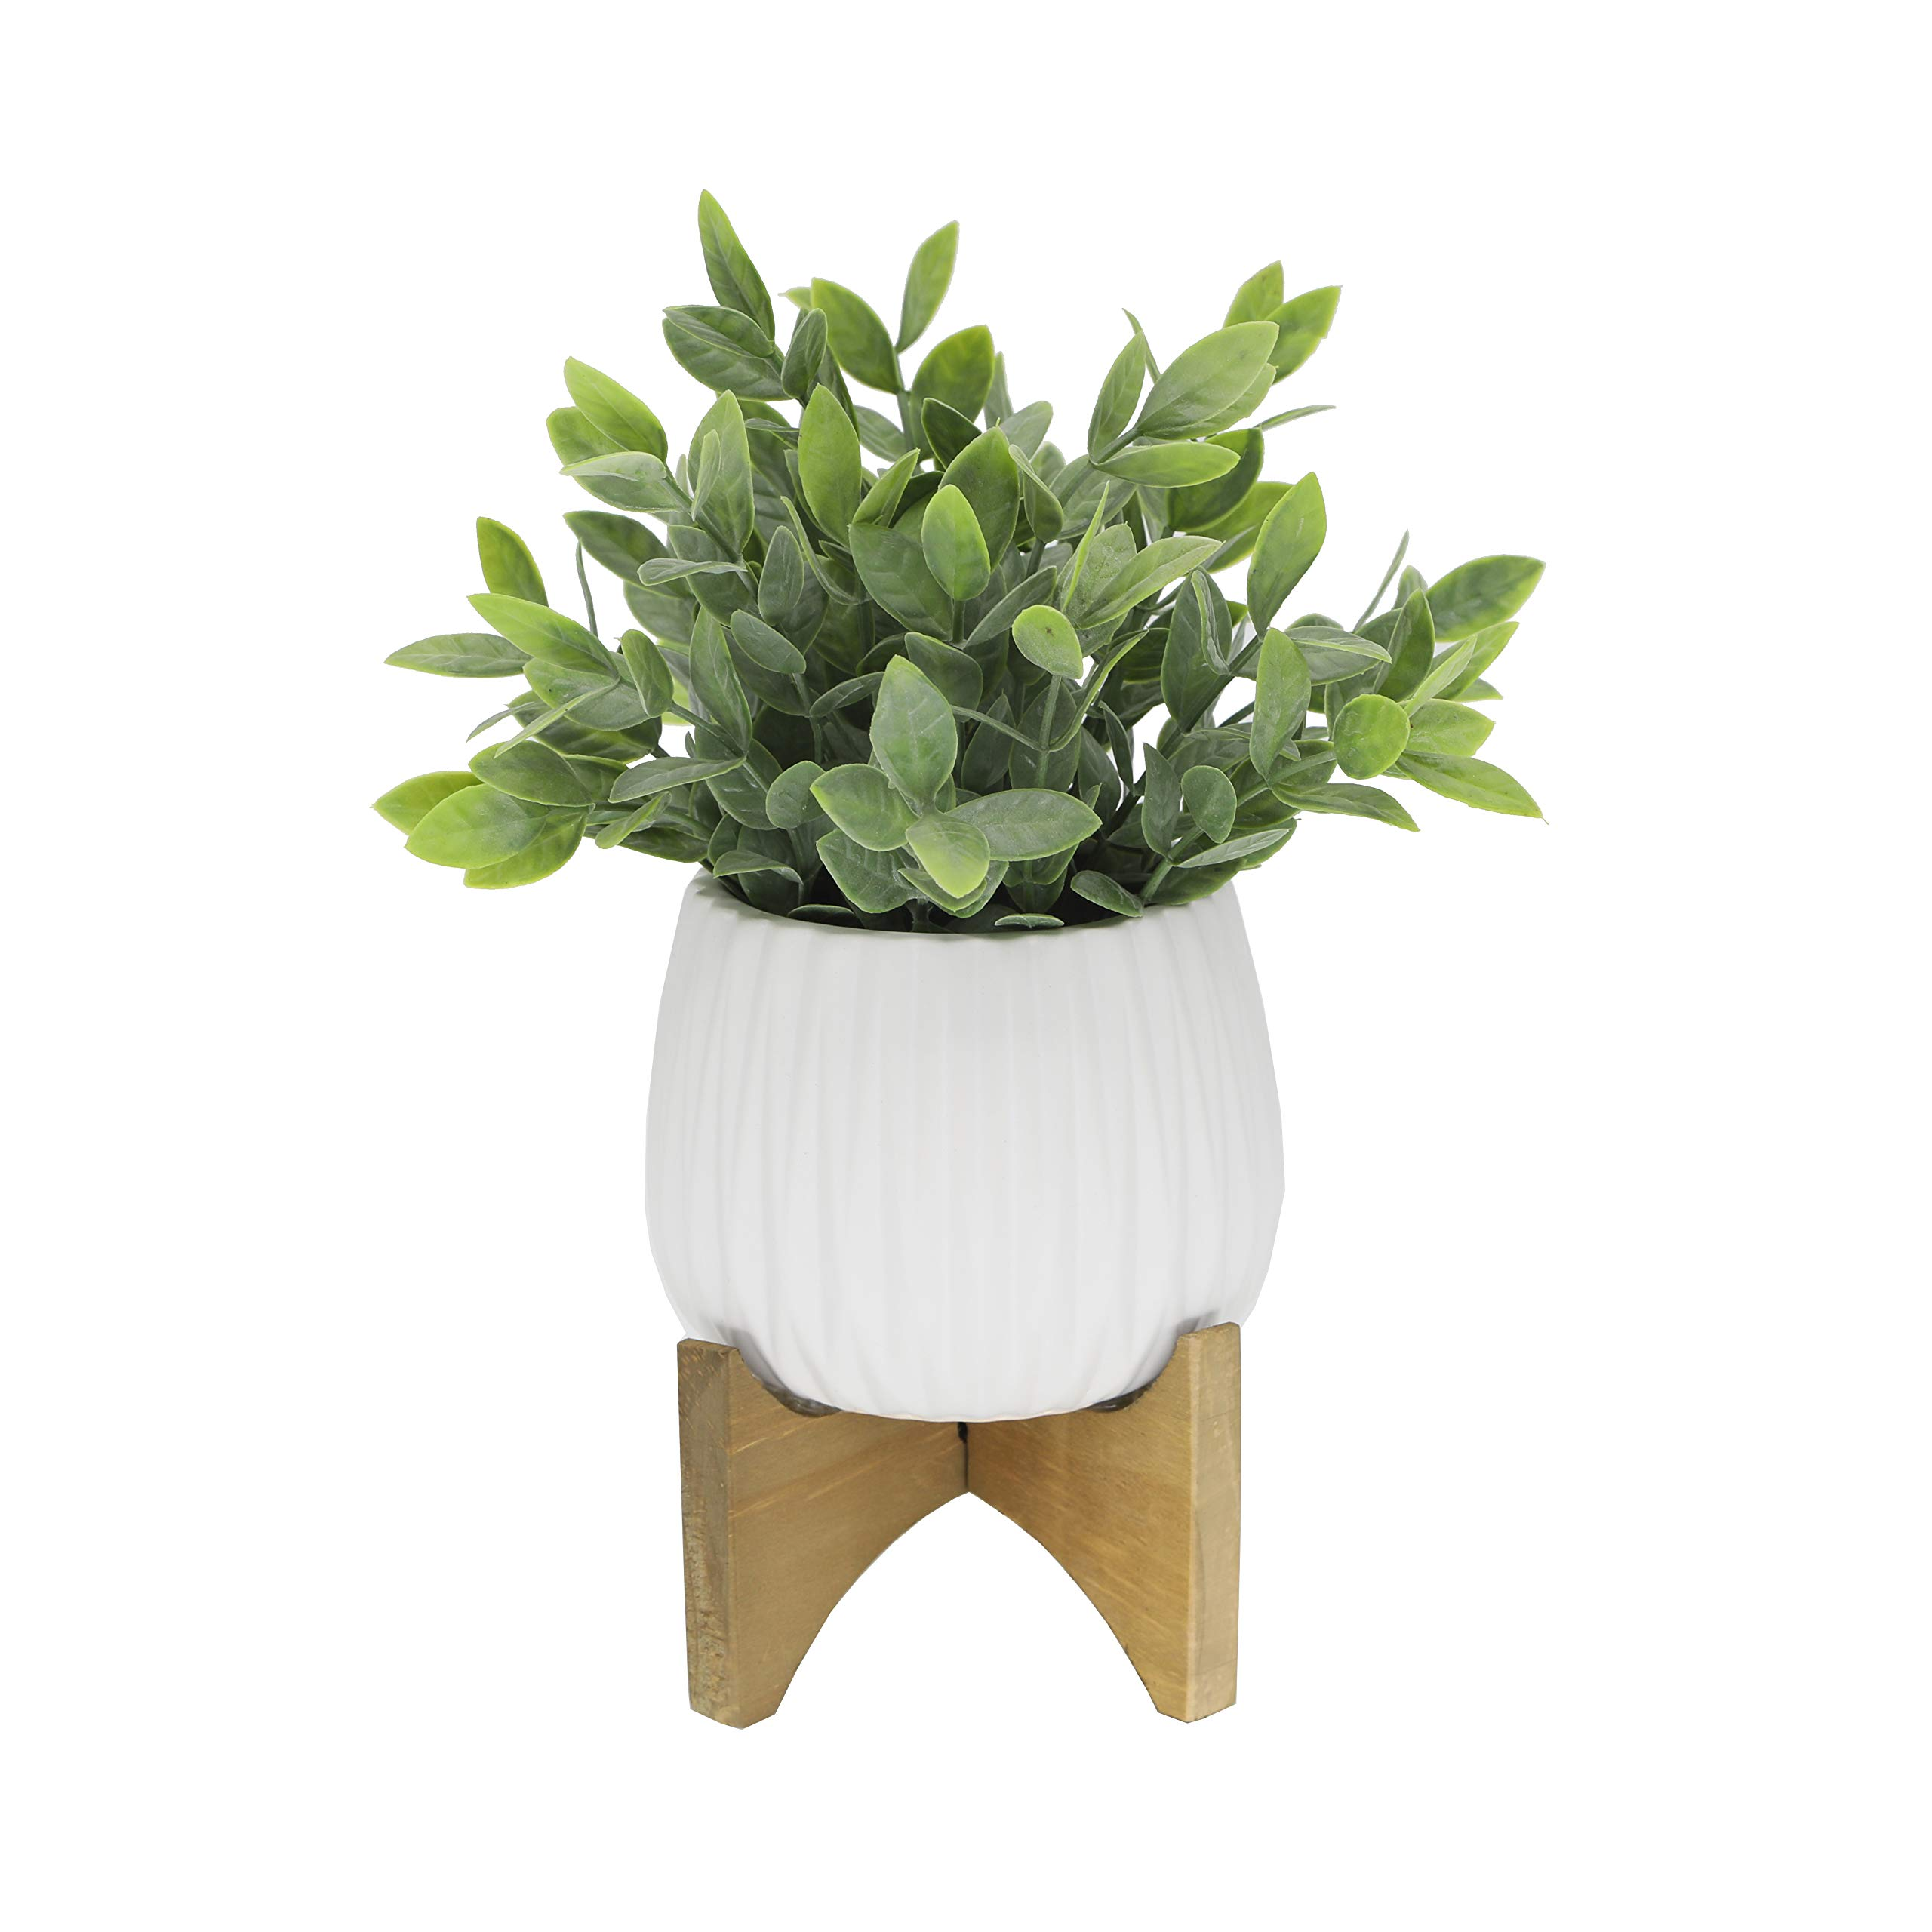 Flora Bunda Artificial Plant Tea Leaf in 5 in Ridge Ceramic Pot on Wood Stand,Matte White